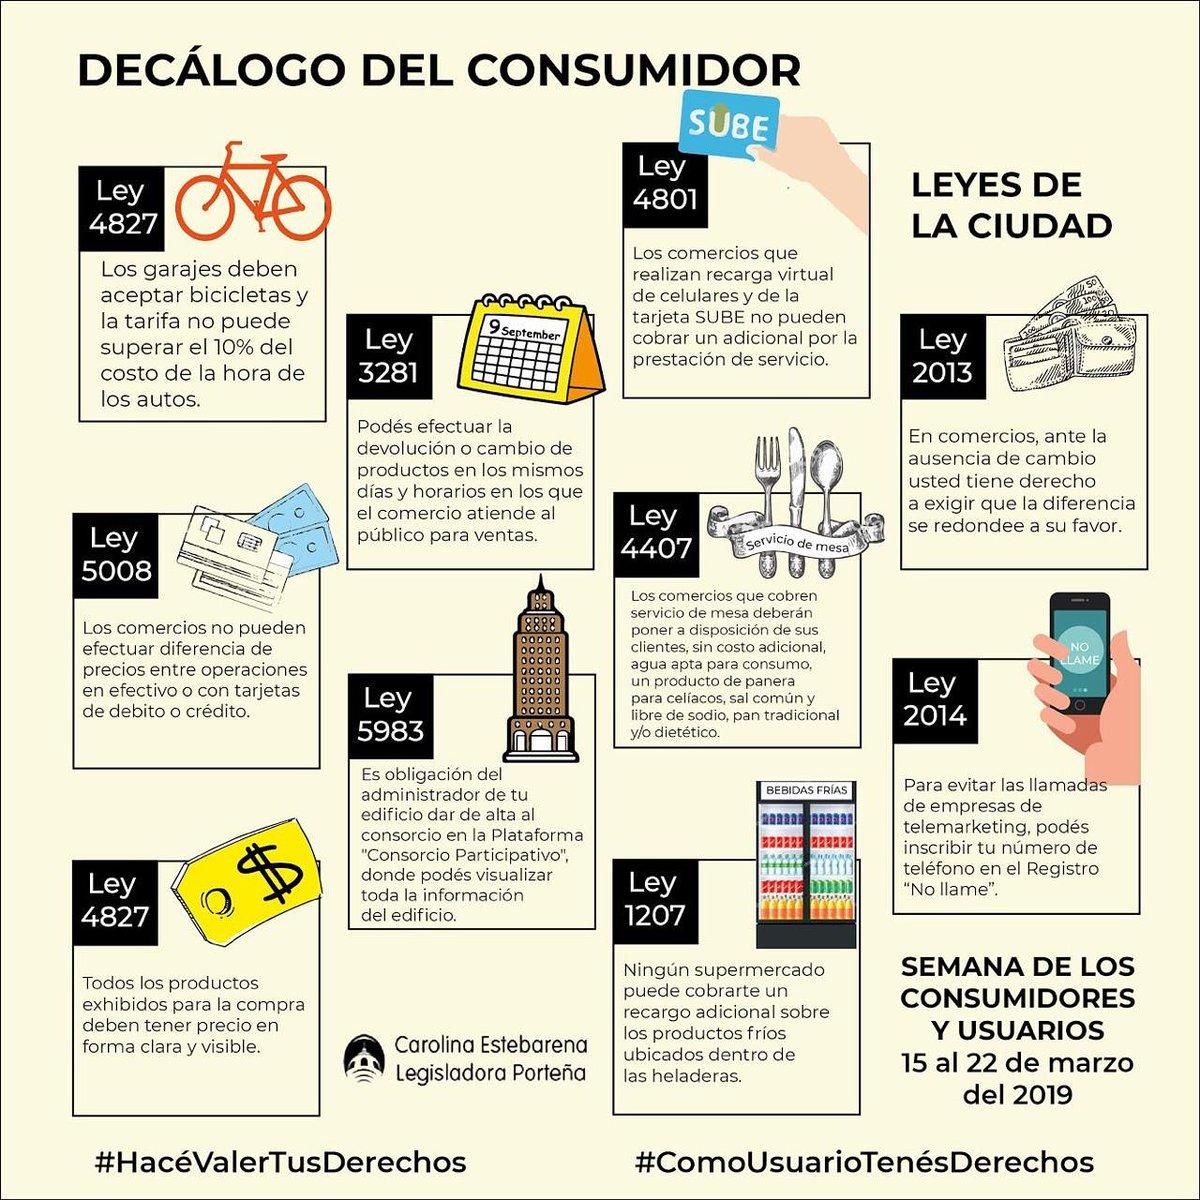 Carolina Estebarena's photo on #DiaMundialDelConsumidor